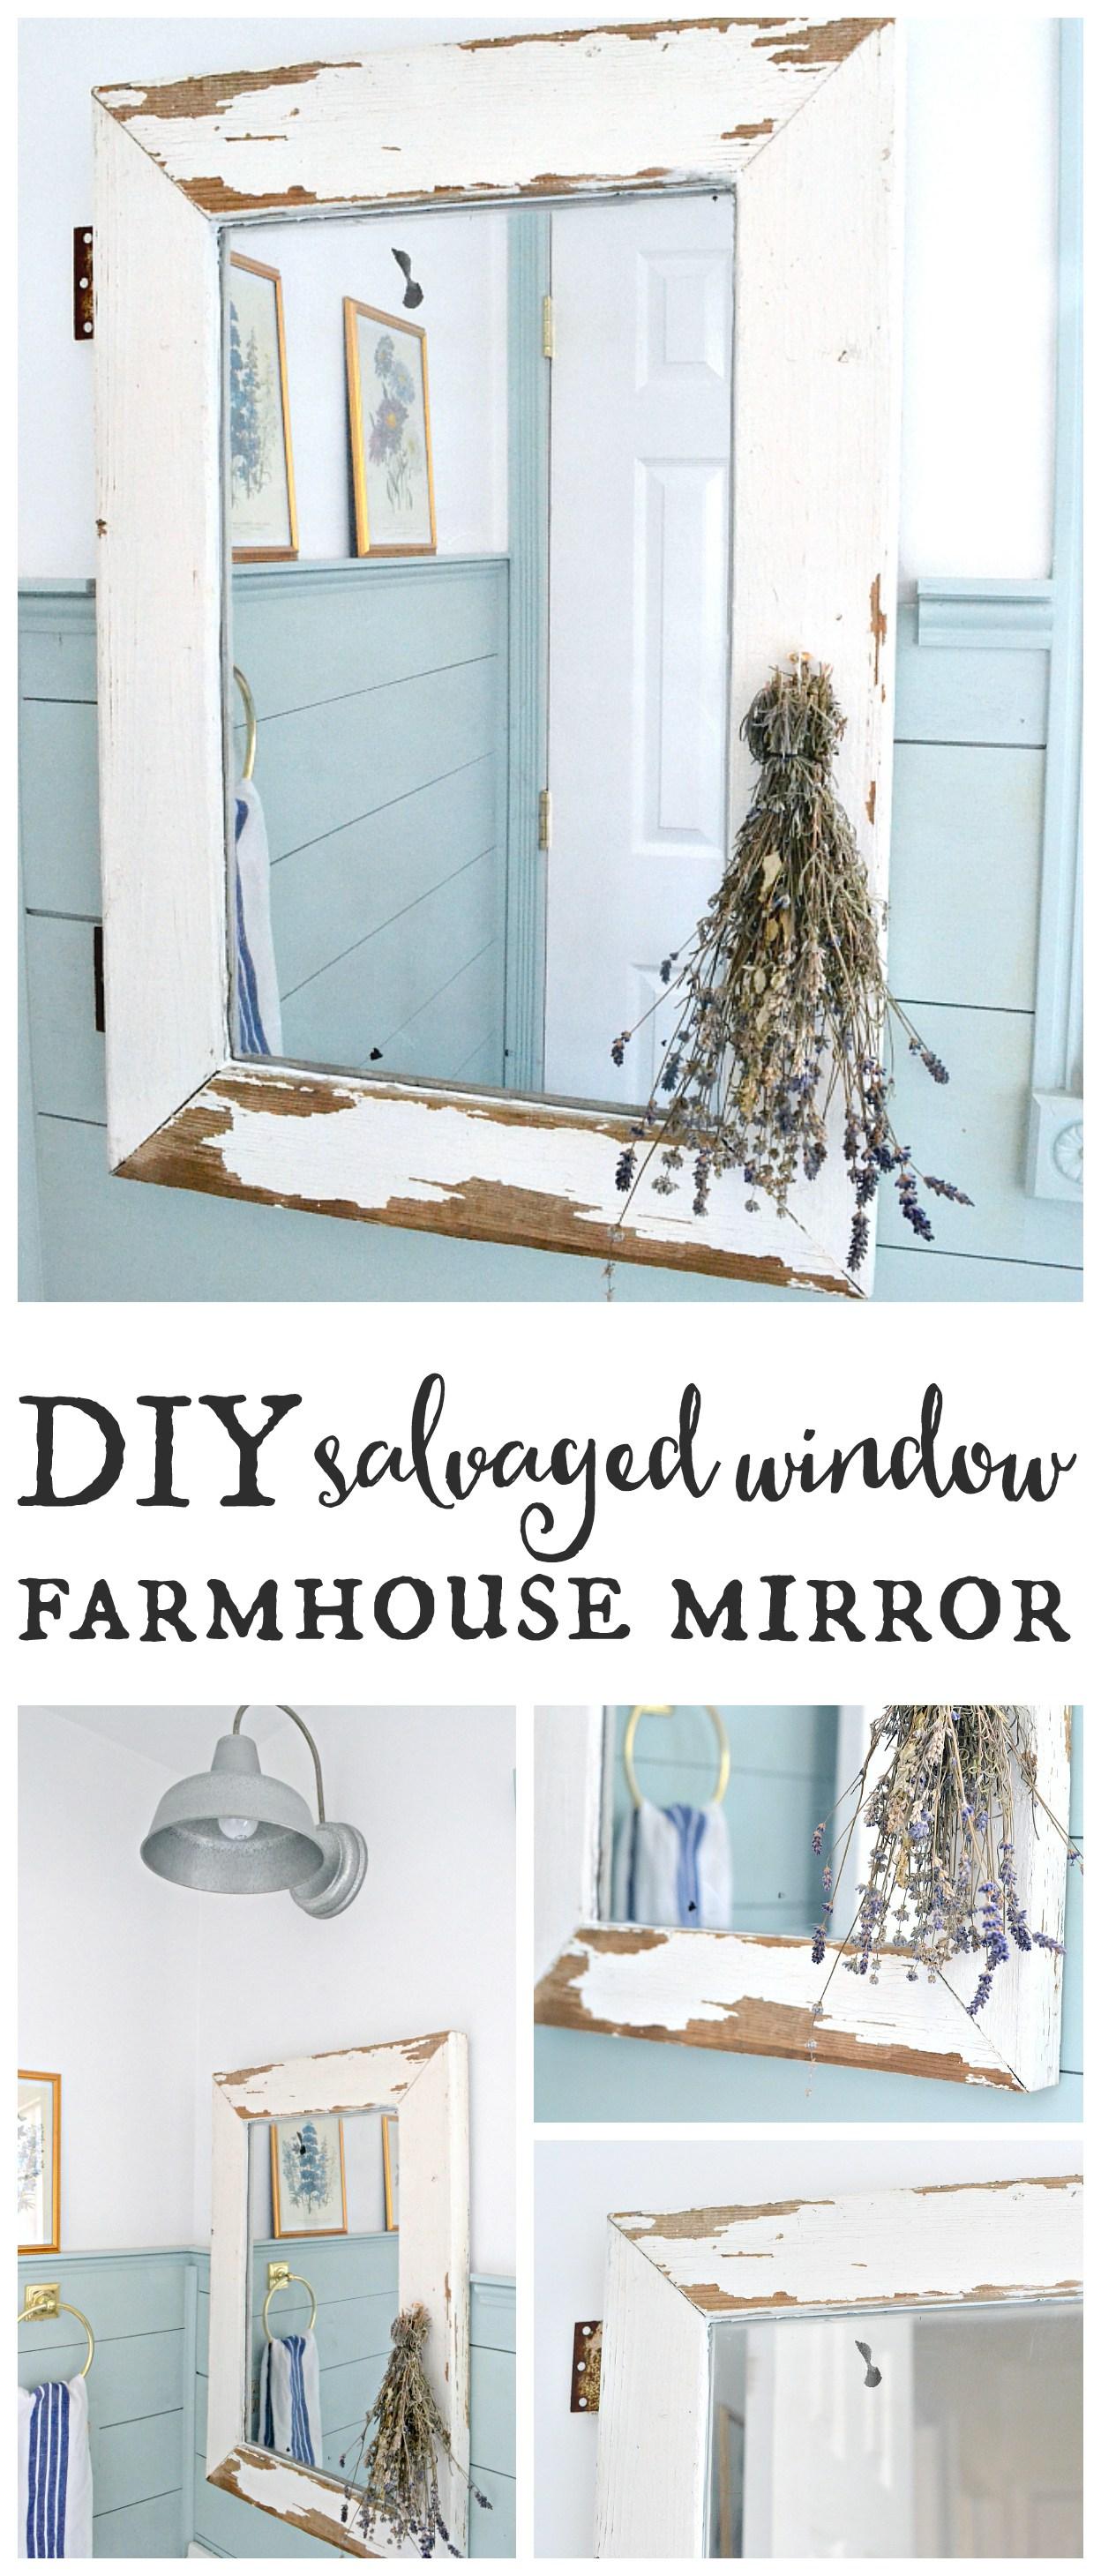 Salvaged-window-farmhouse-mirror.-Turn-a-salvaged-window-into-a-farmhouse-mirror-in-just-a-few-easy-steps-Find-it-on-theweatheredfox.com_